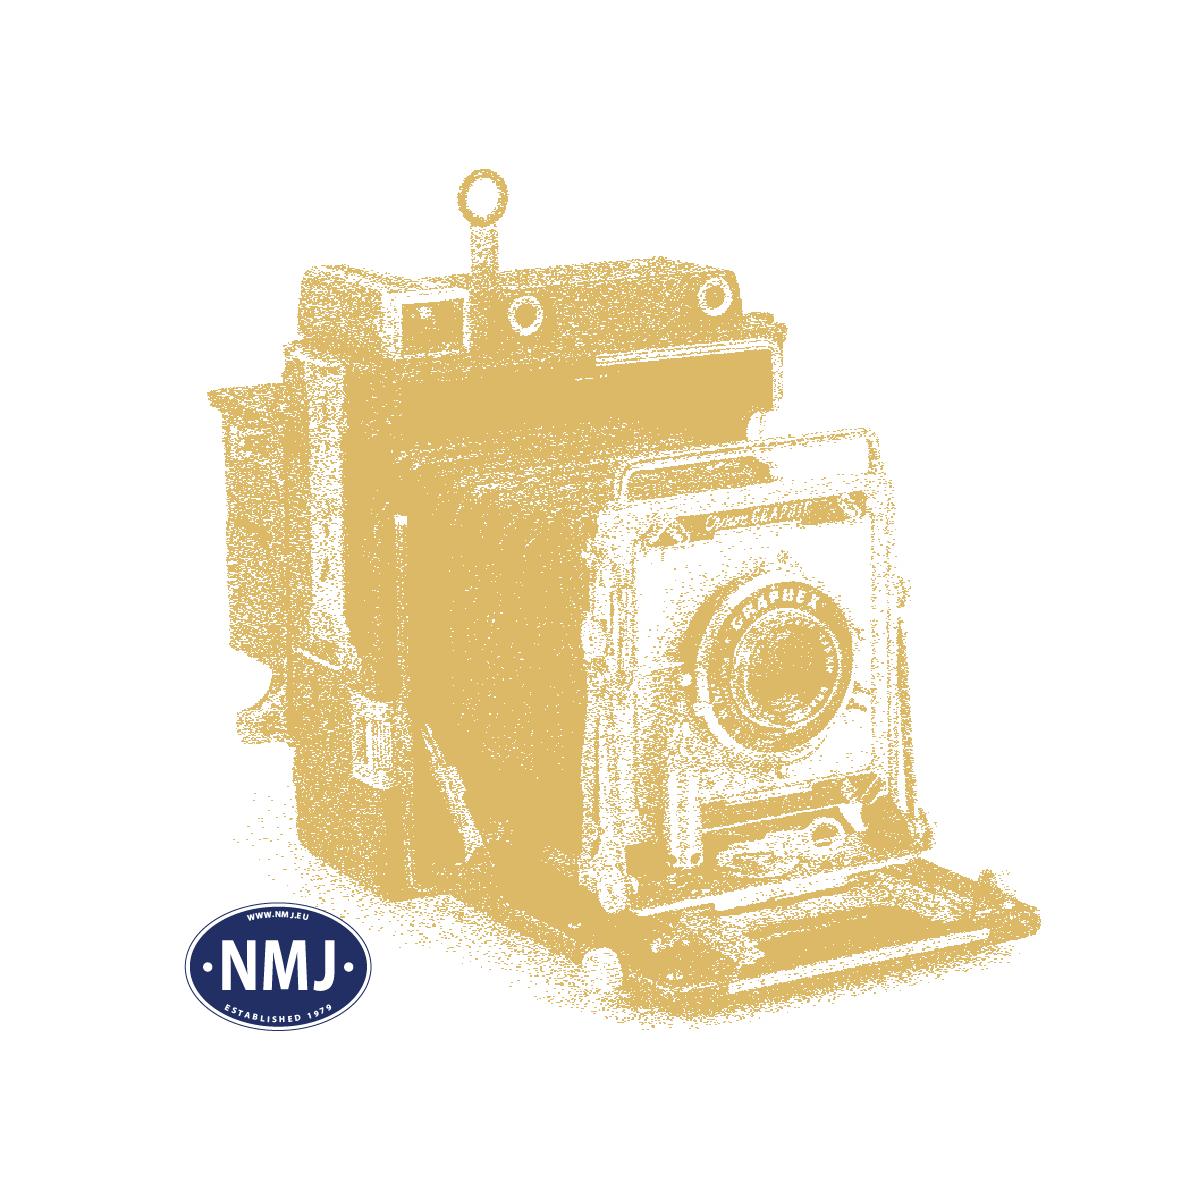 NMJT507.108 - NMJ Topline CargoNet Lgns 42 76 443 2015-1, Tollpost-Globe Thermo